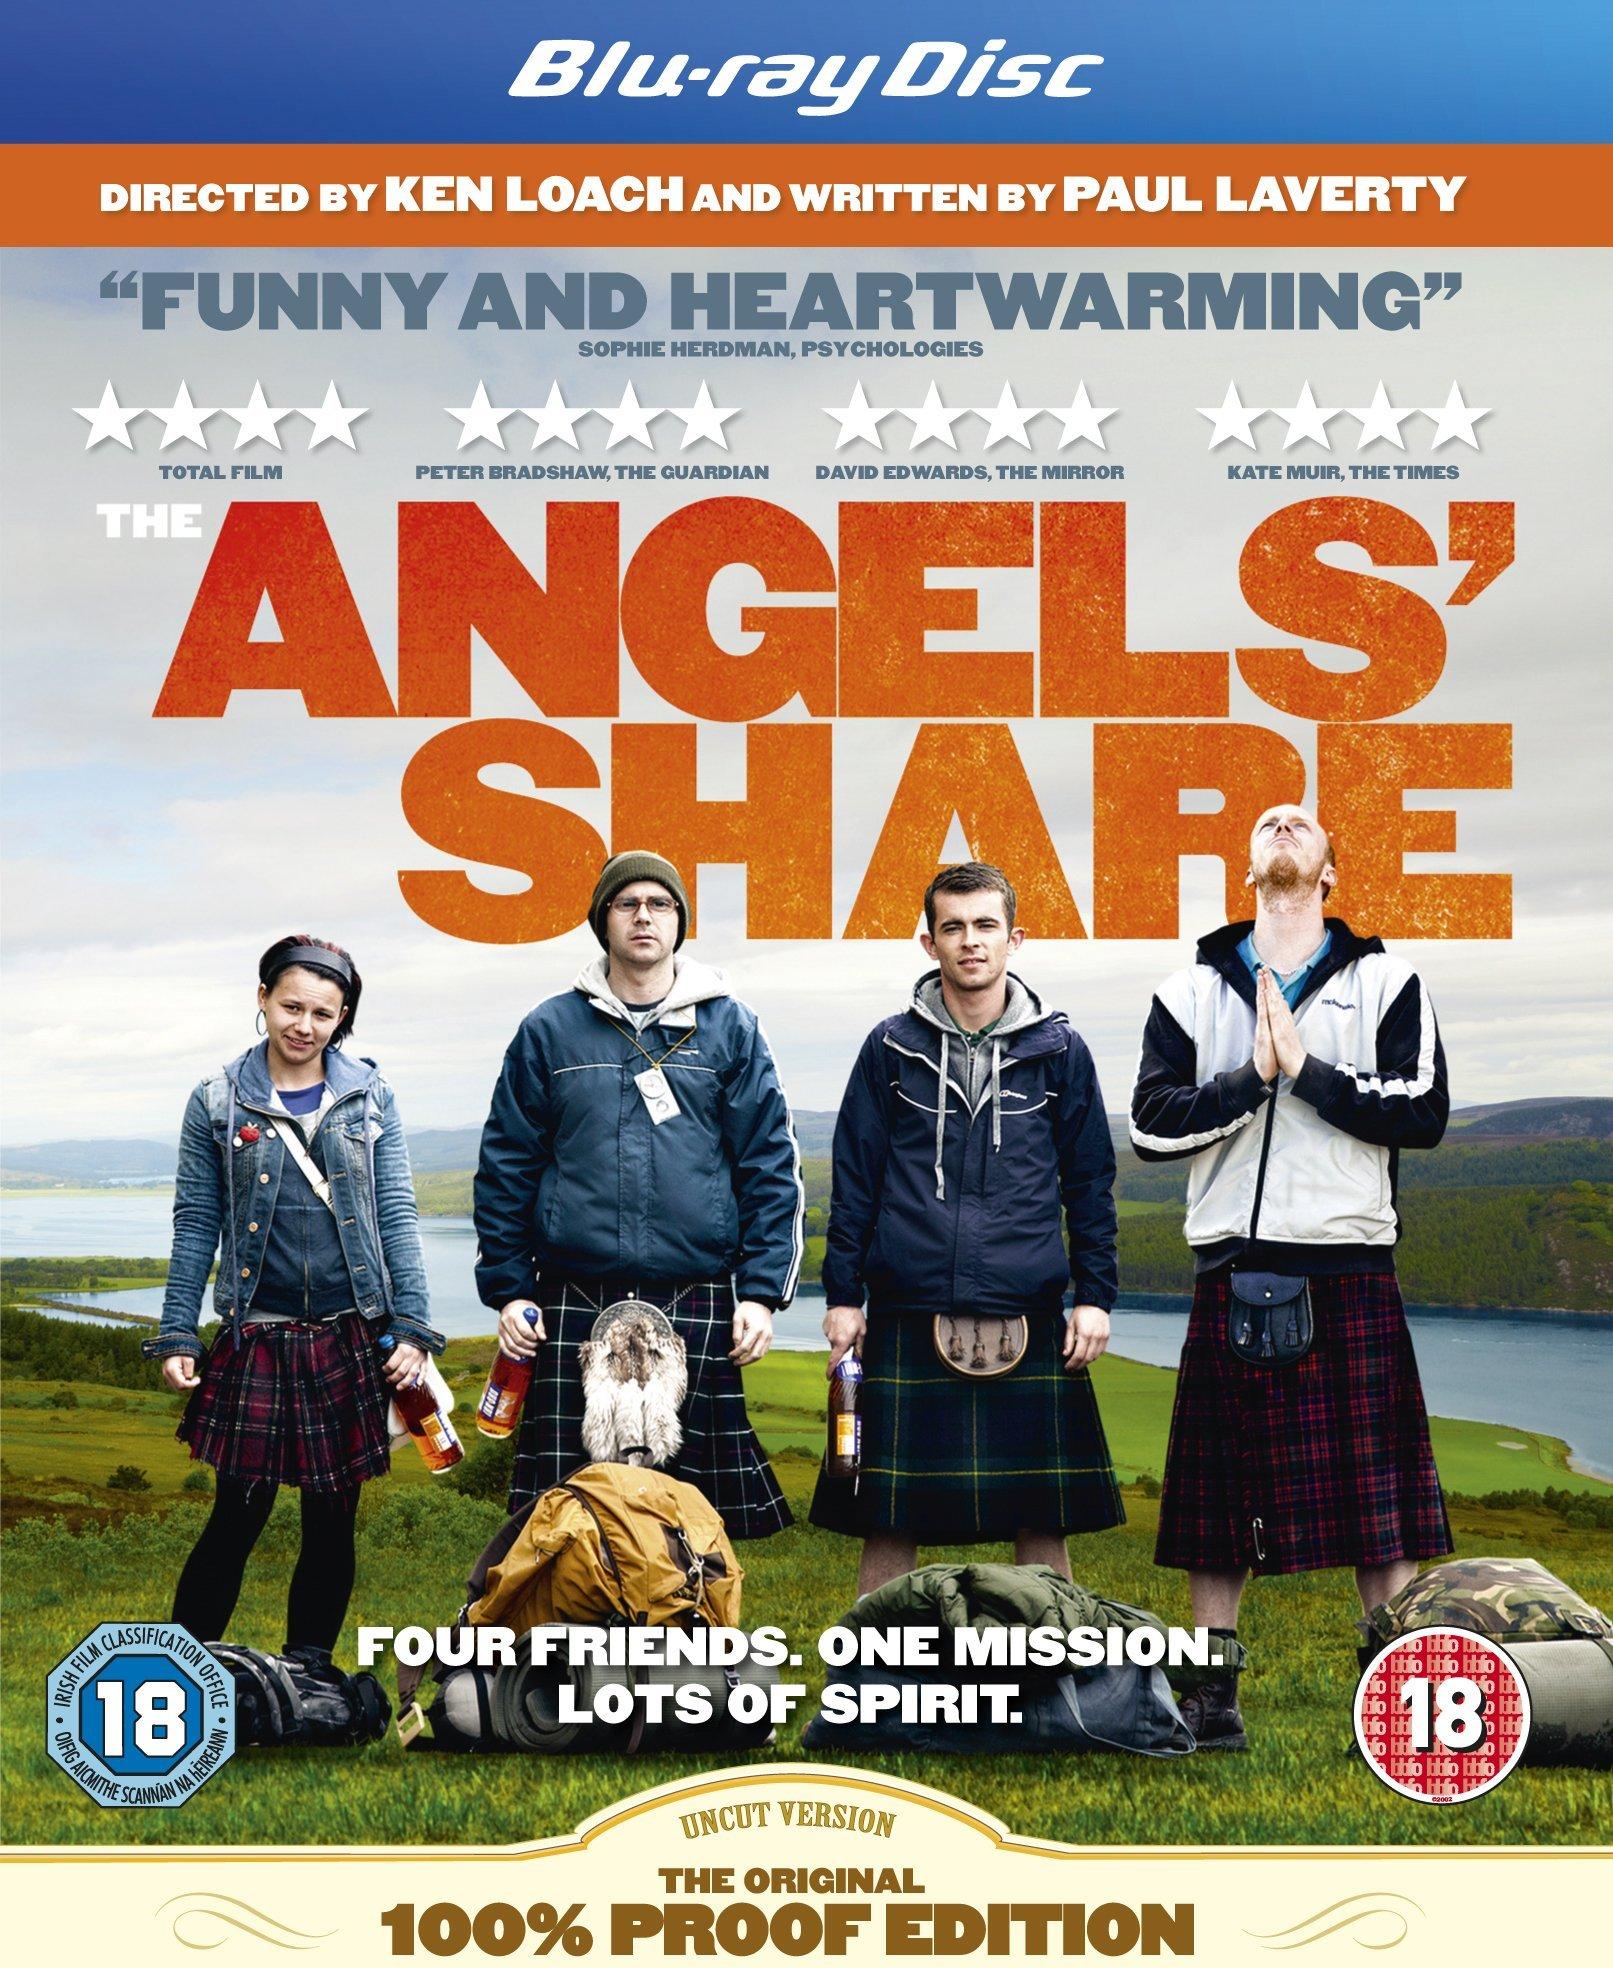 Gary Maitland, William Ruane, Jasmin Riggins, and Paul Brannigan in The Angels' Share (2012)